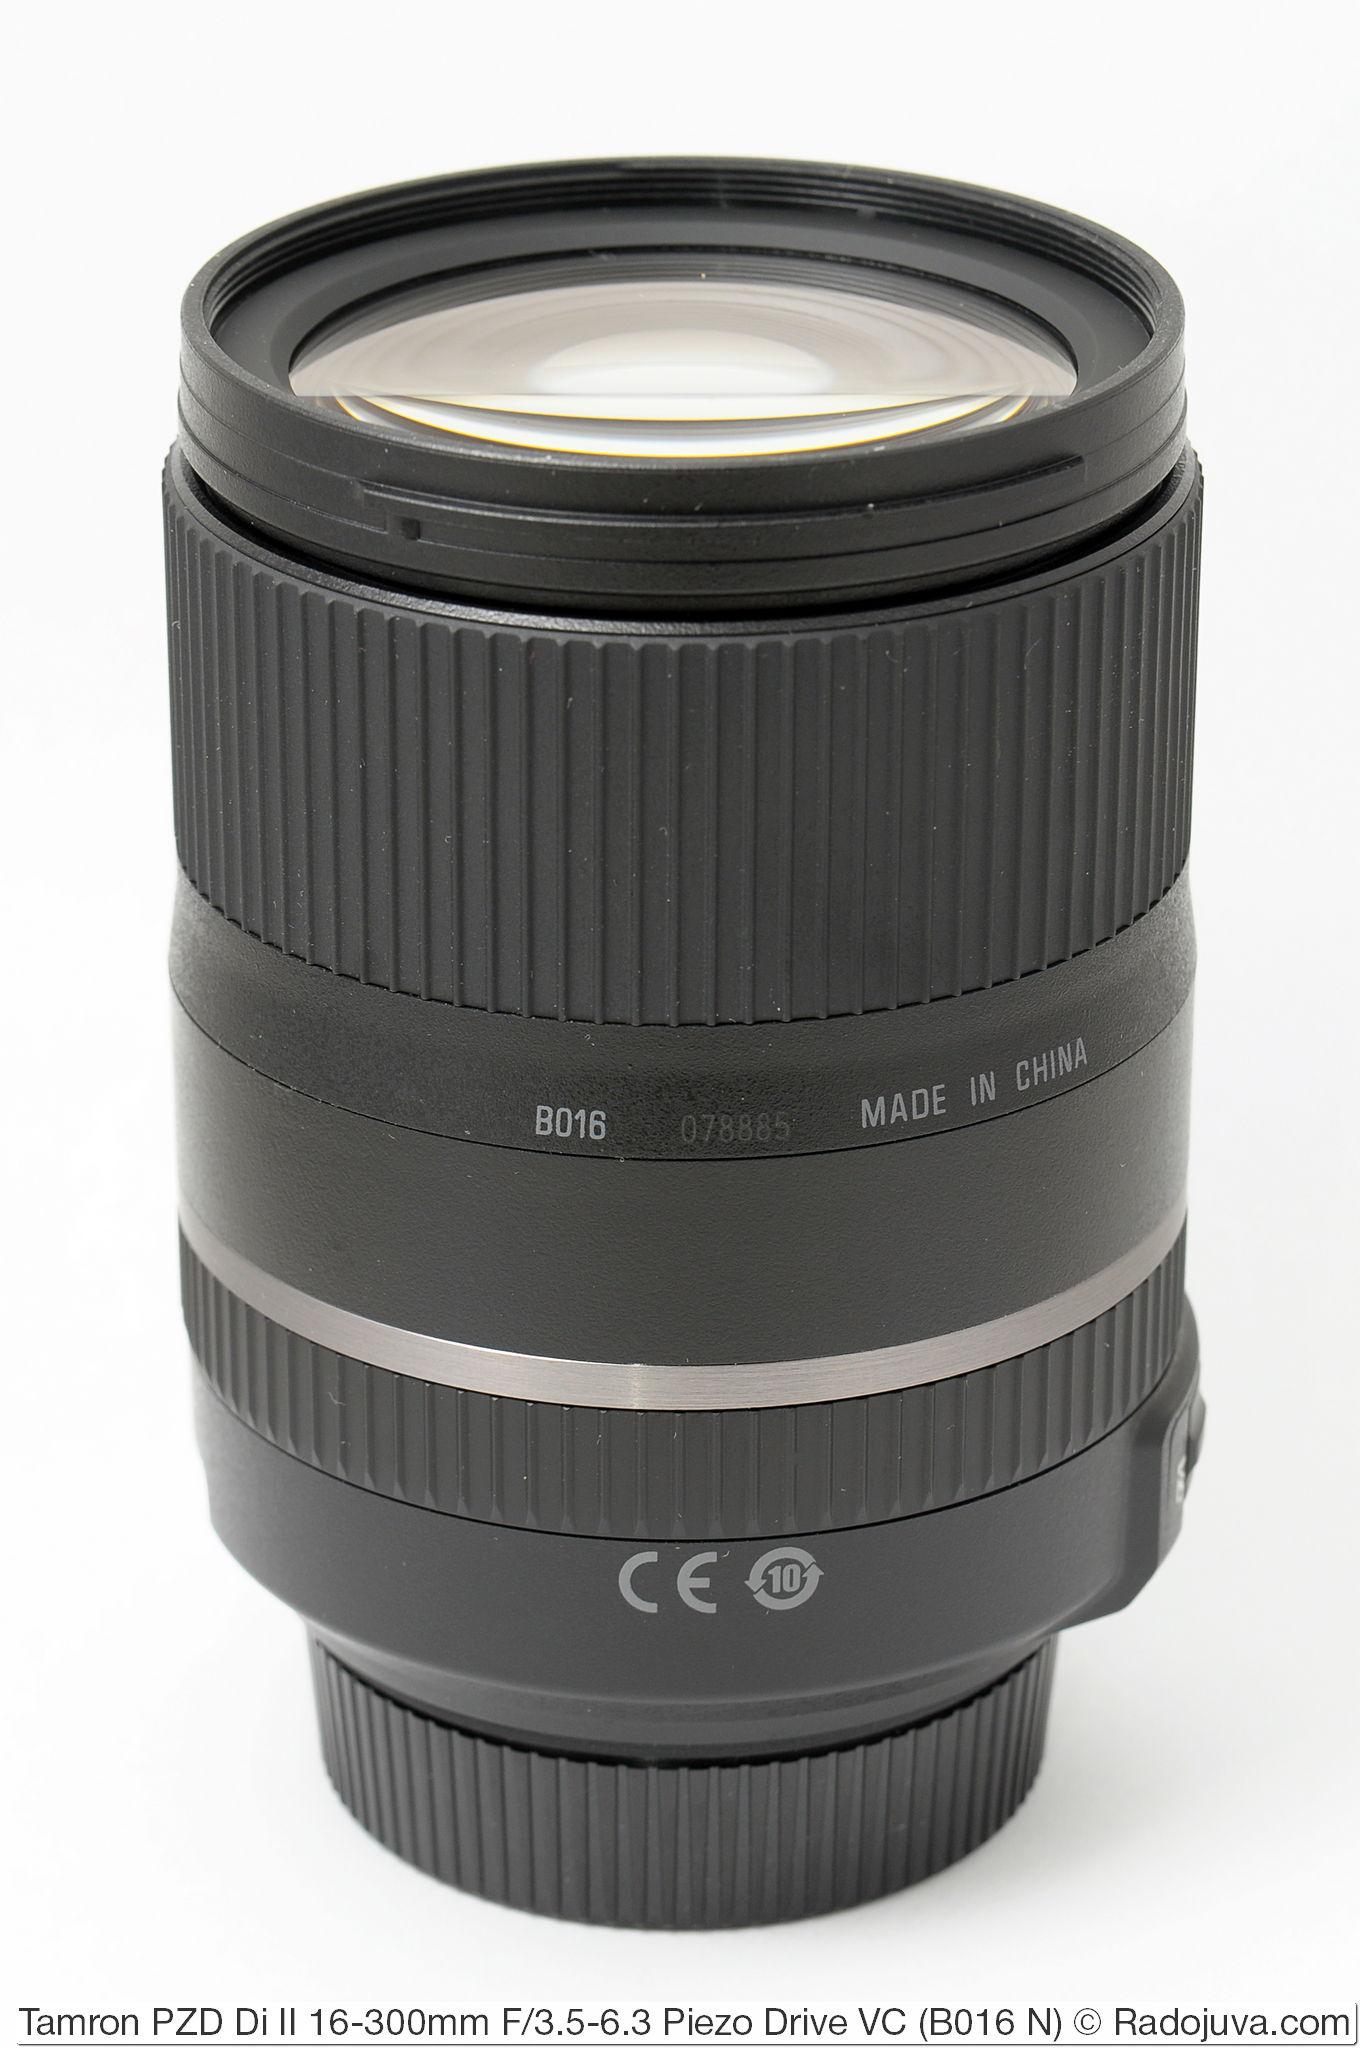 Tamron 16-300mm F/3.5-6.3 Di II PZD VC Model B016